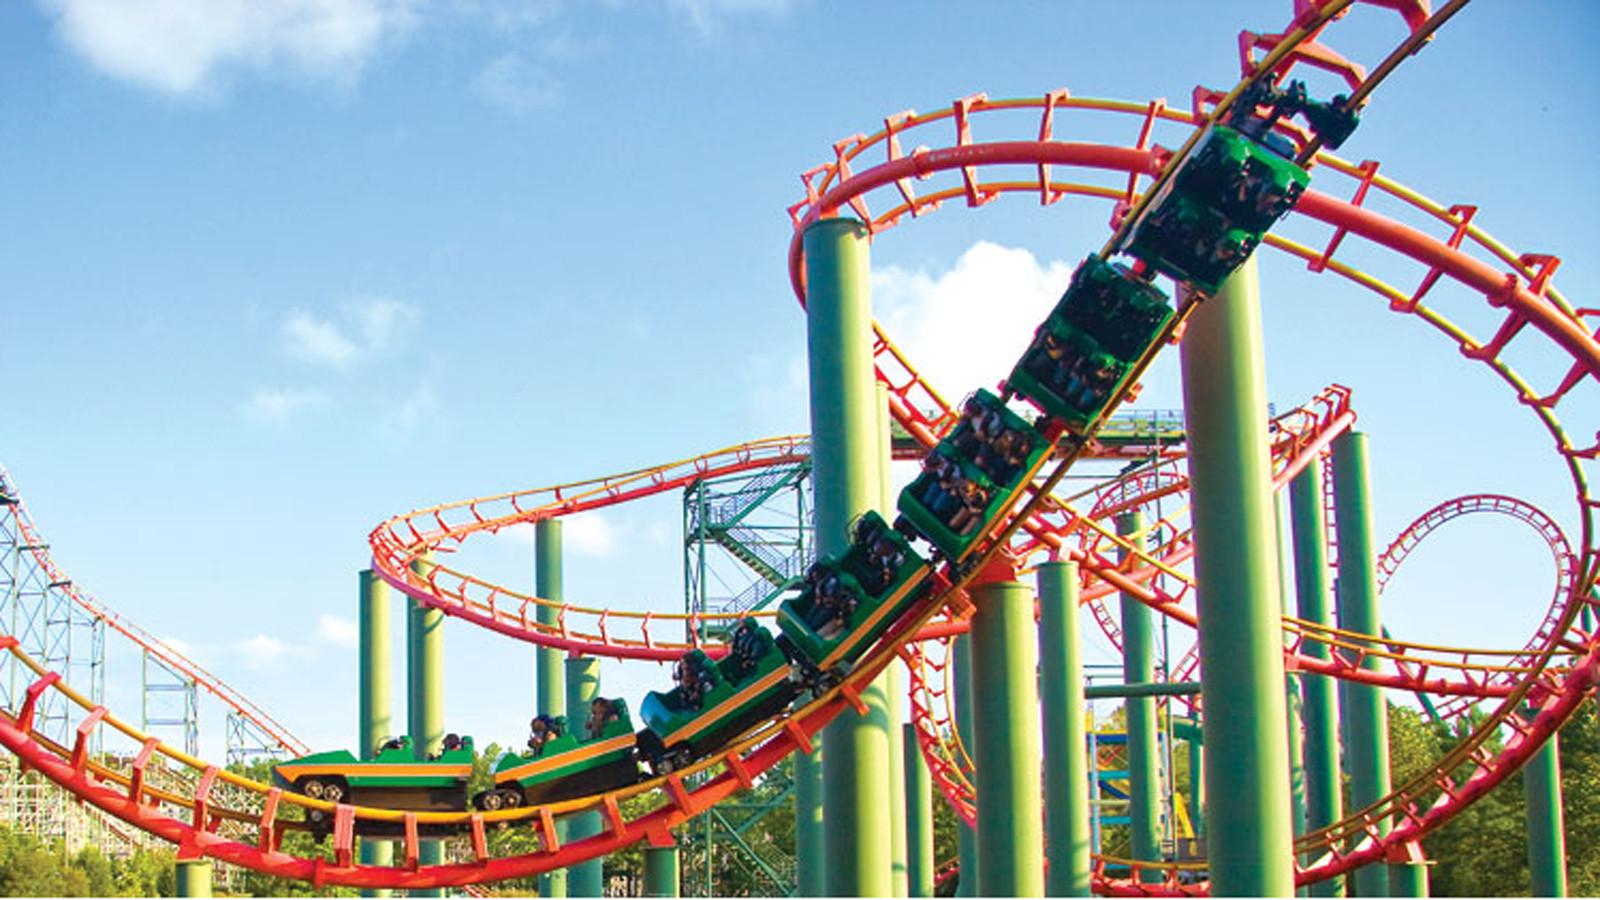 3d roller coaster rides online dating 9